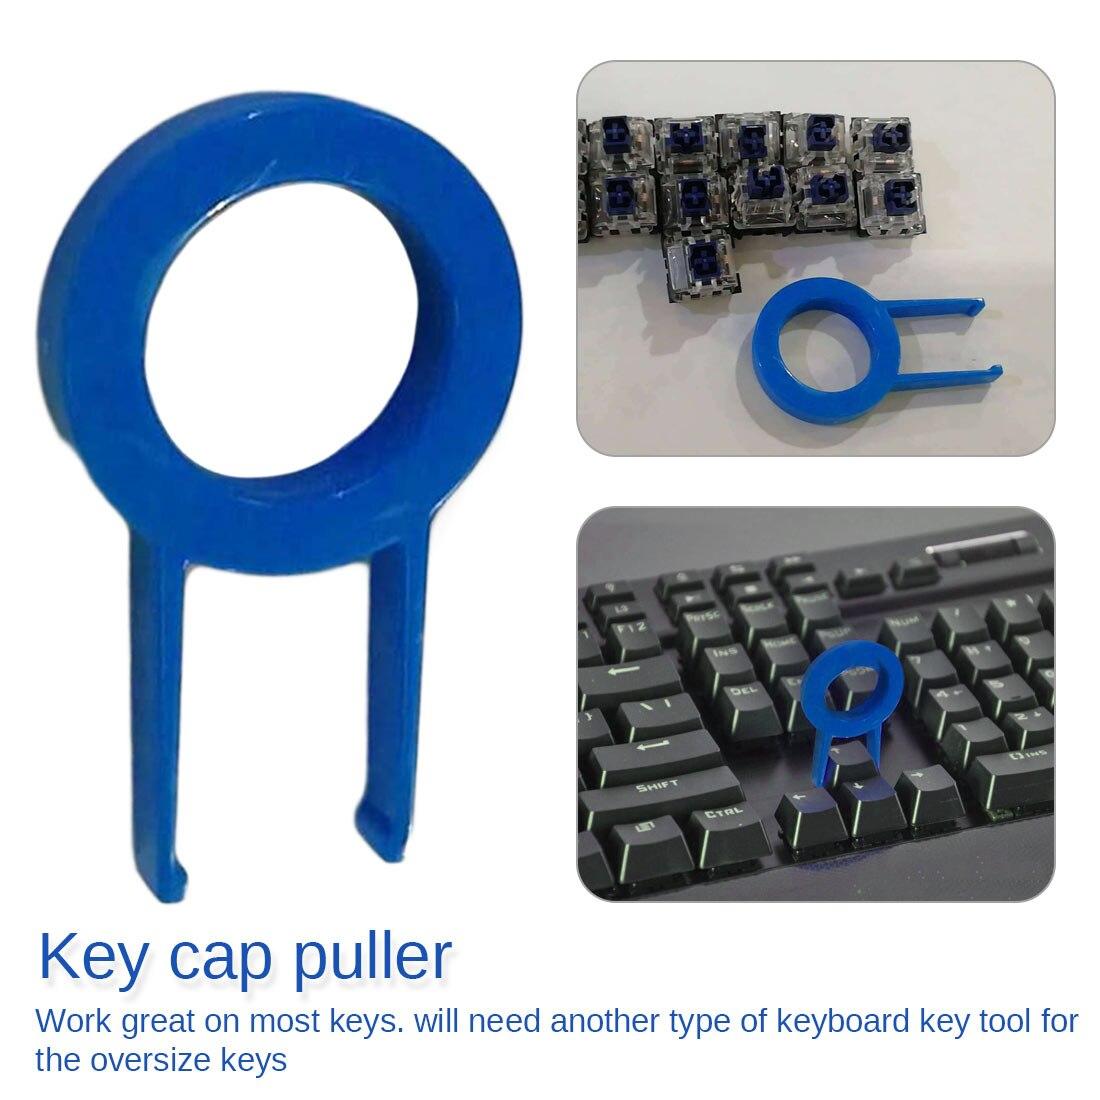 Keycap Puller Mechanical Keyboard Key Cap Round Key Cap Fixing Tool Keycap Puller Remover